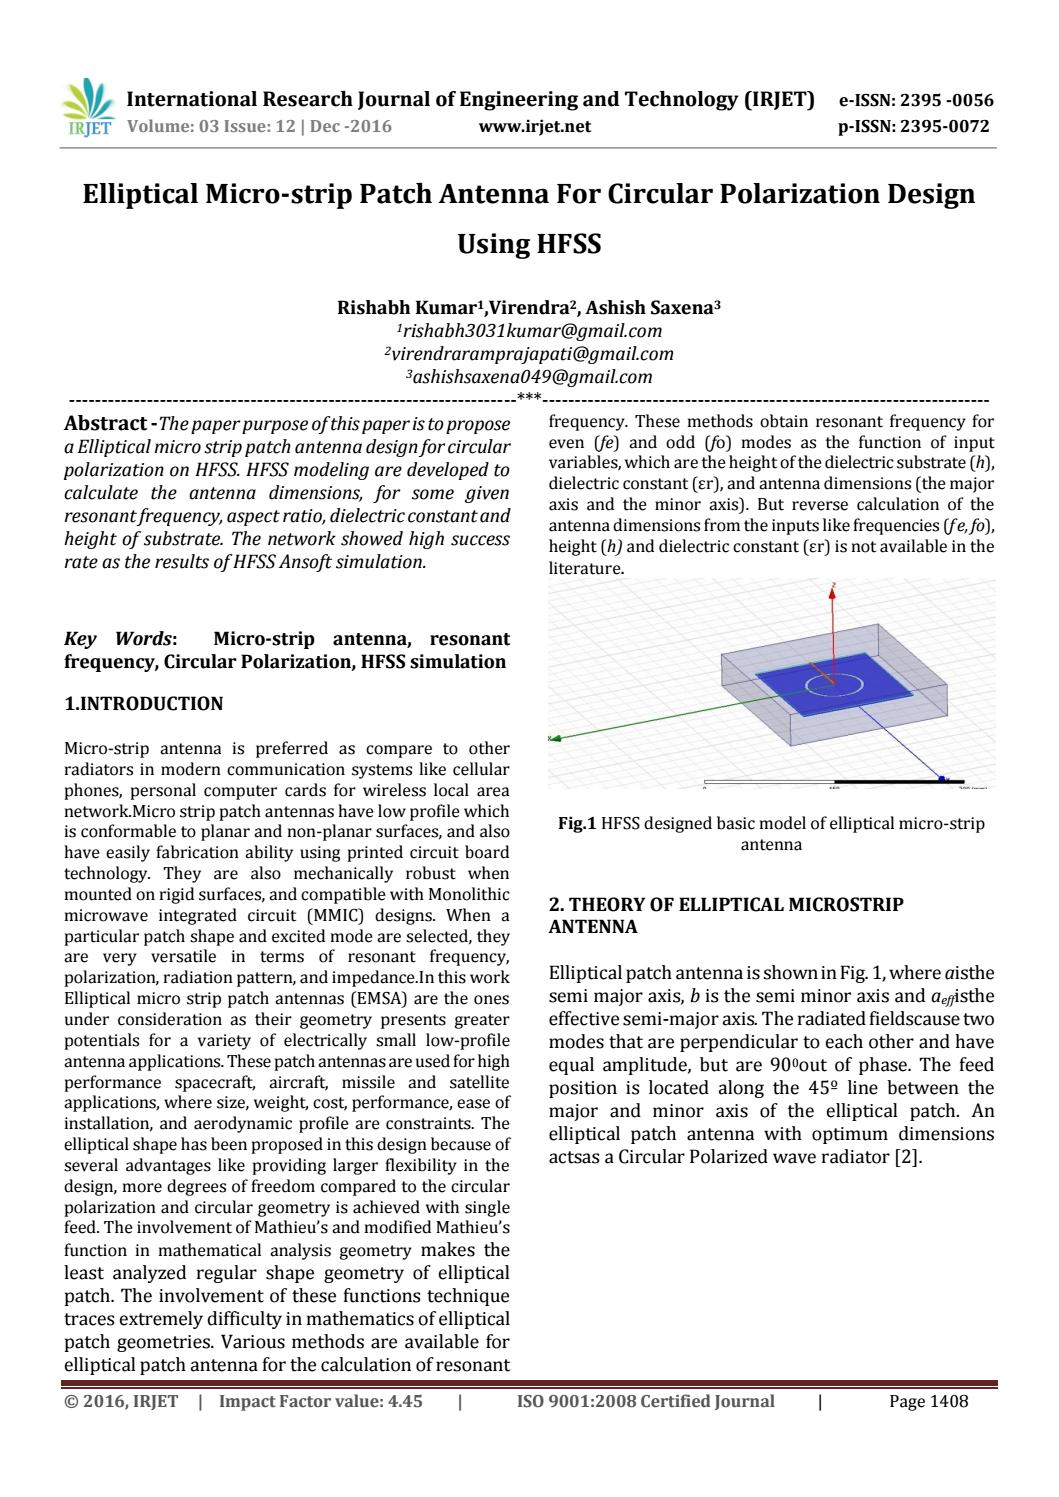 Elliptical Micro-strip Patch Antenna For Circular Polarization